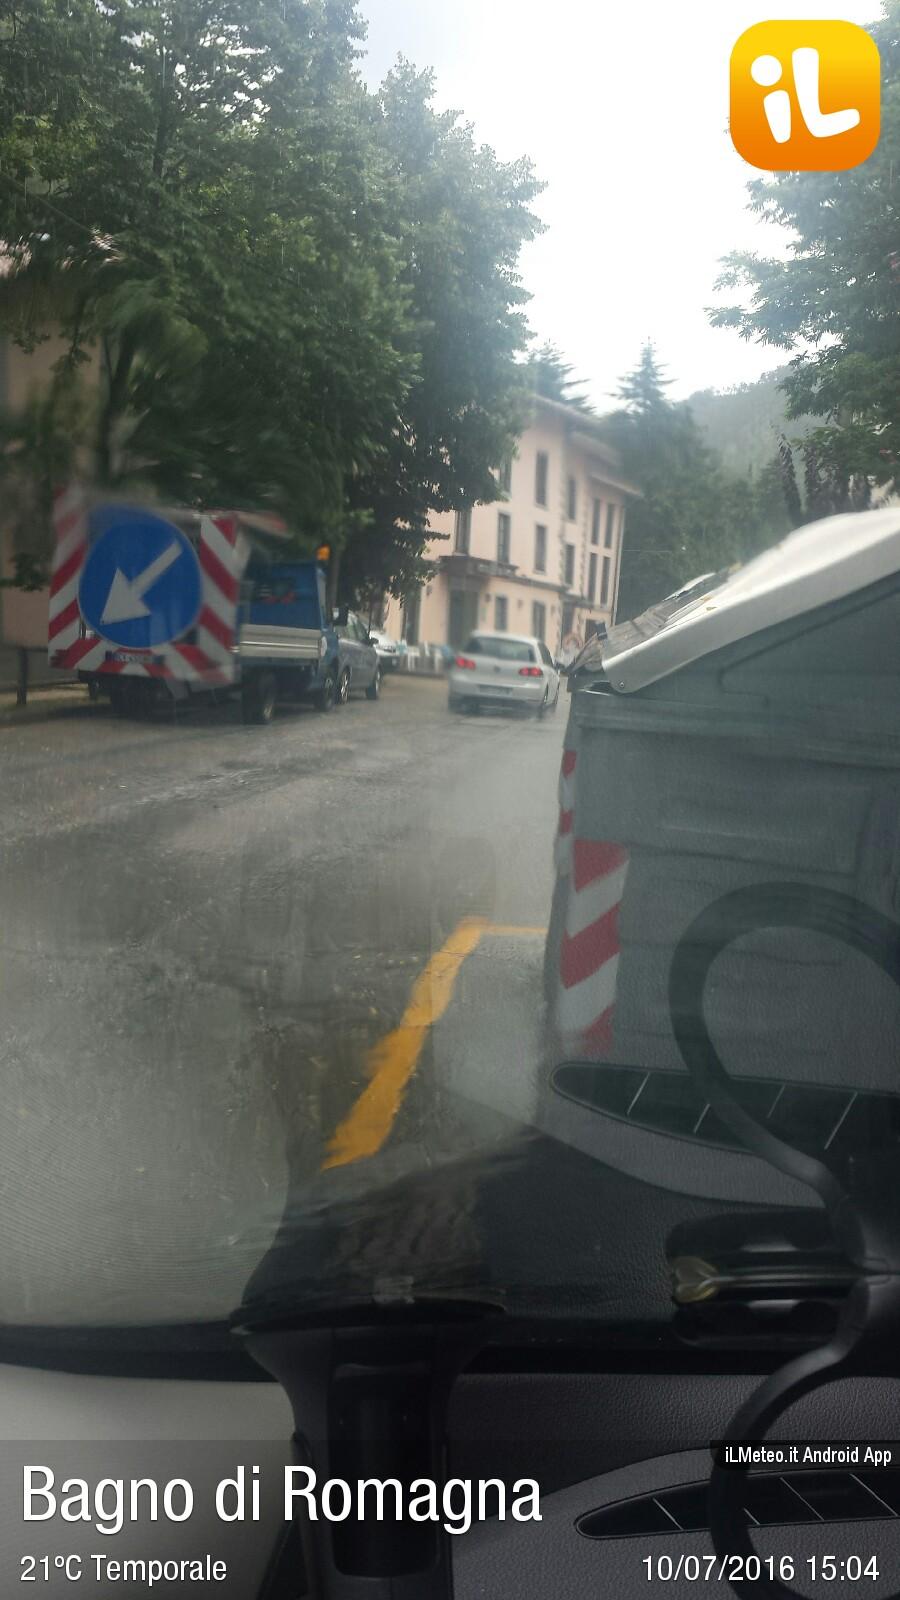 Foto meteo bagno di romagna bagno di romagna ore 15 04 - Meteo it bagno di romagna ...